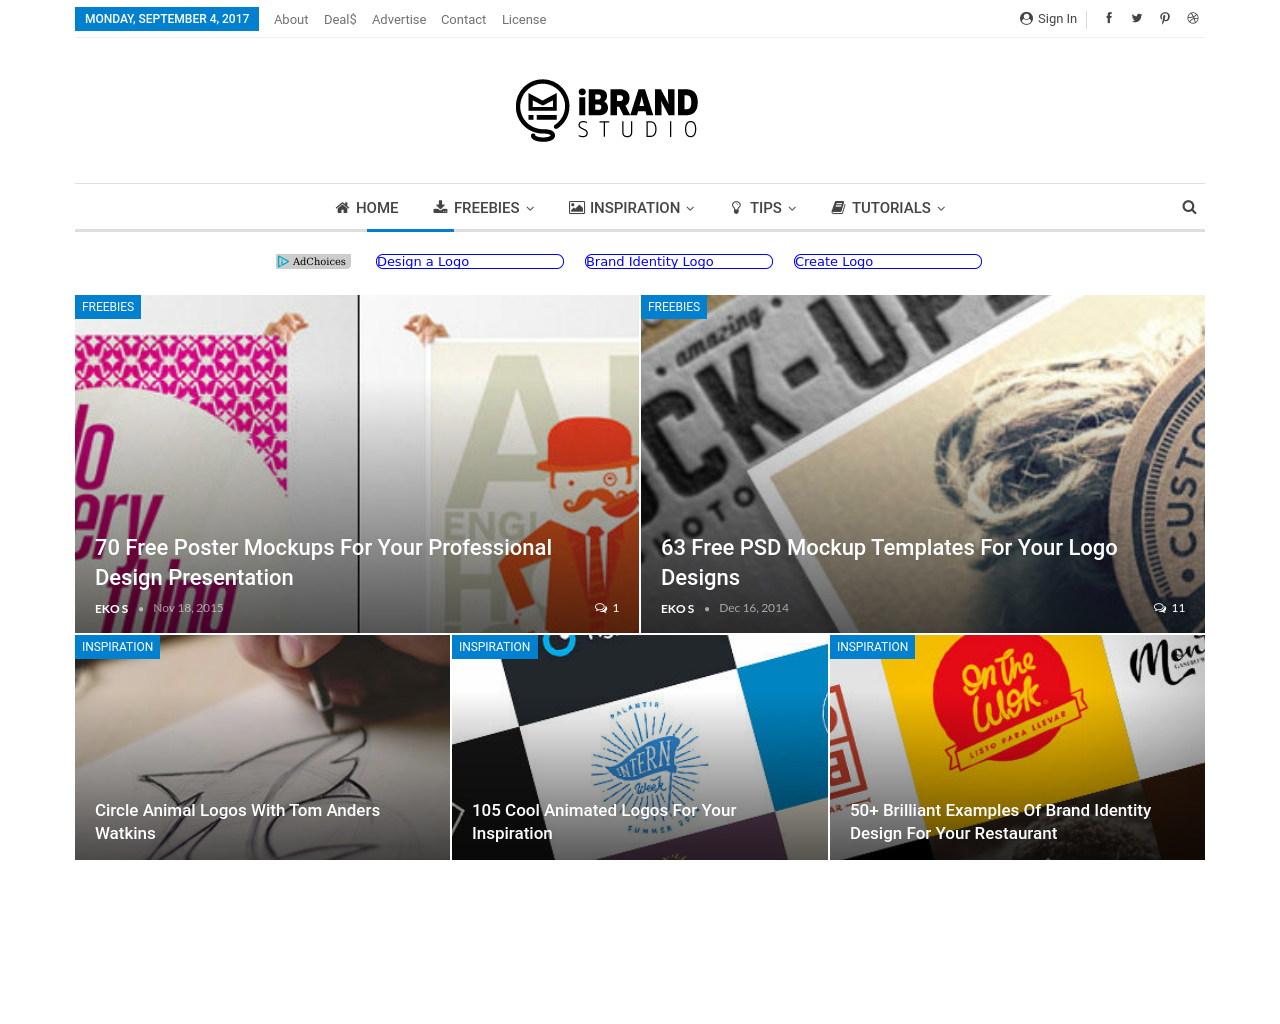 Ibrandstudio-Advertising-Reviews-Pricing